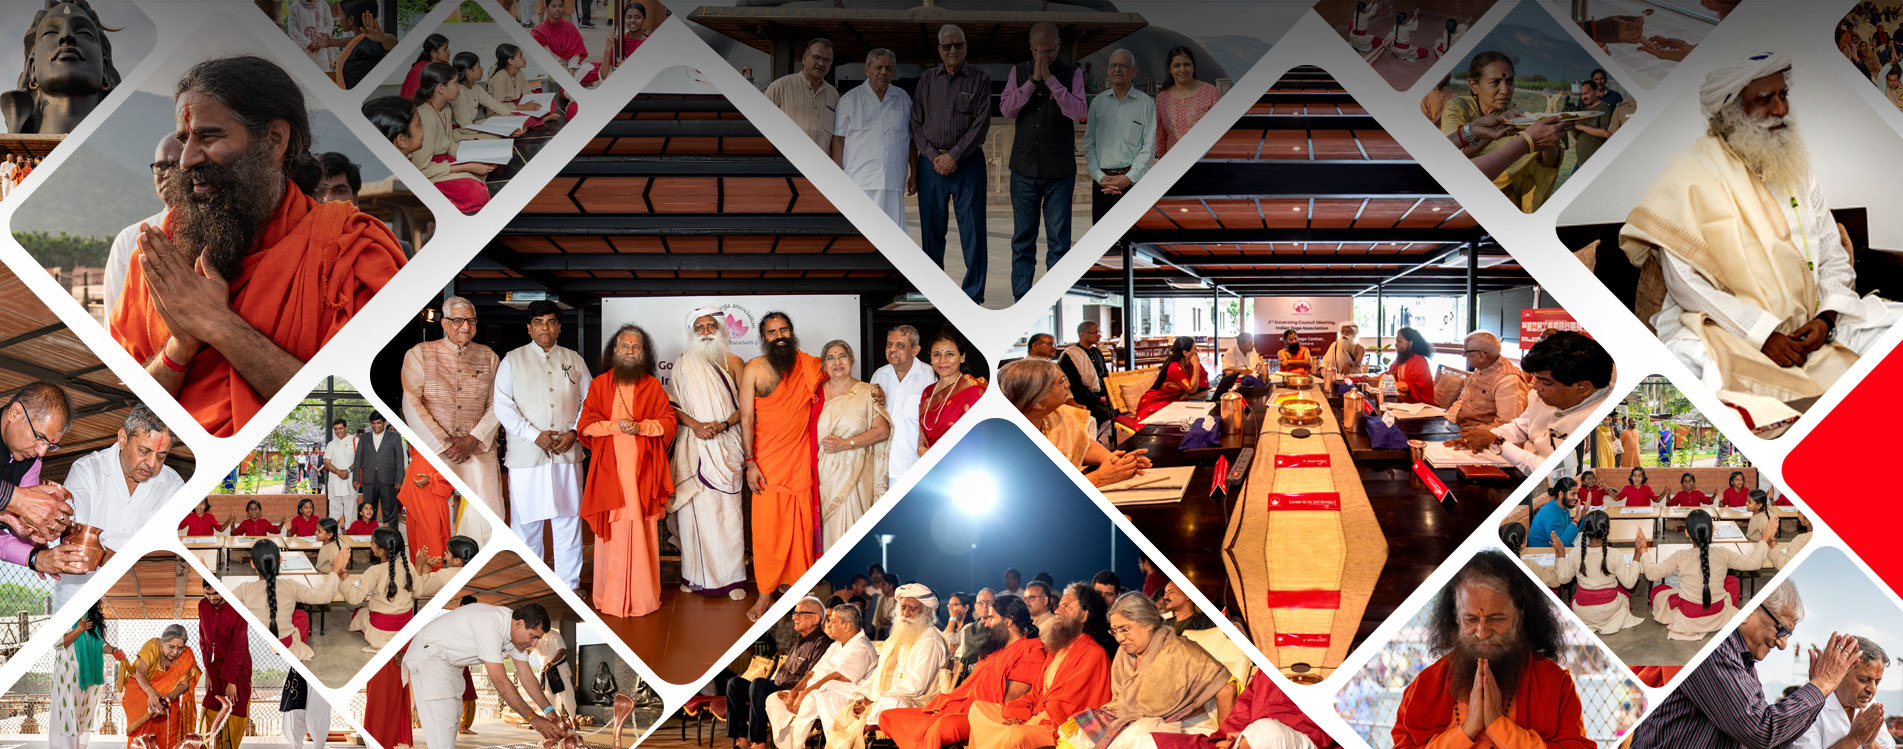 GC-Meeting-collage-banner